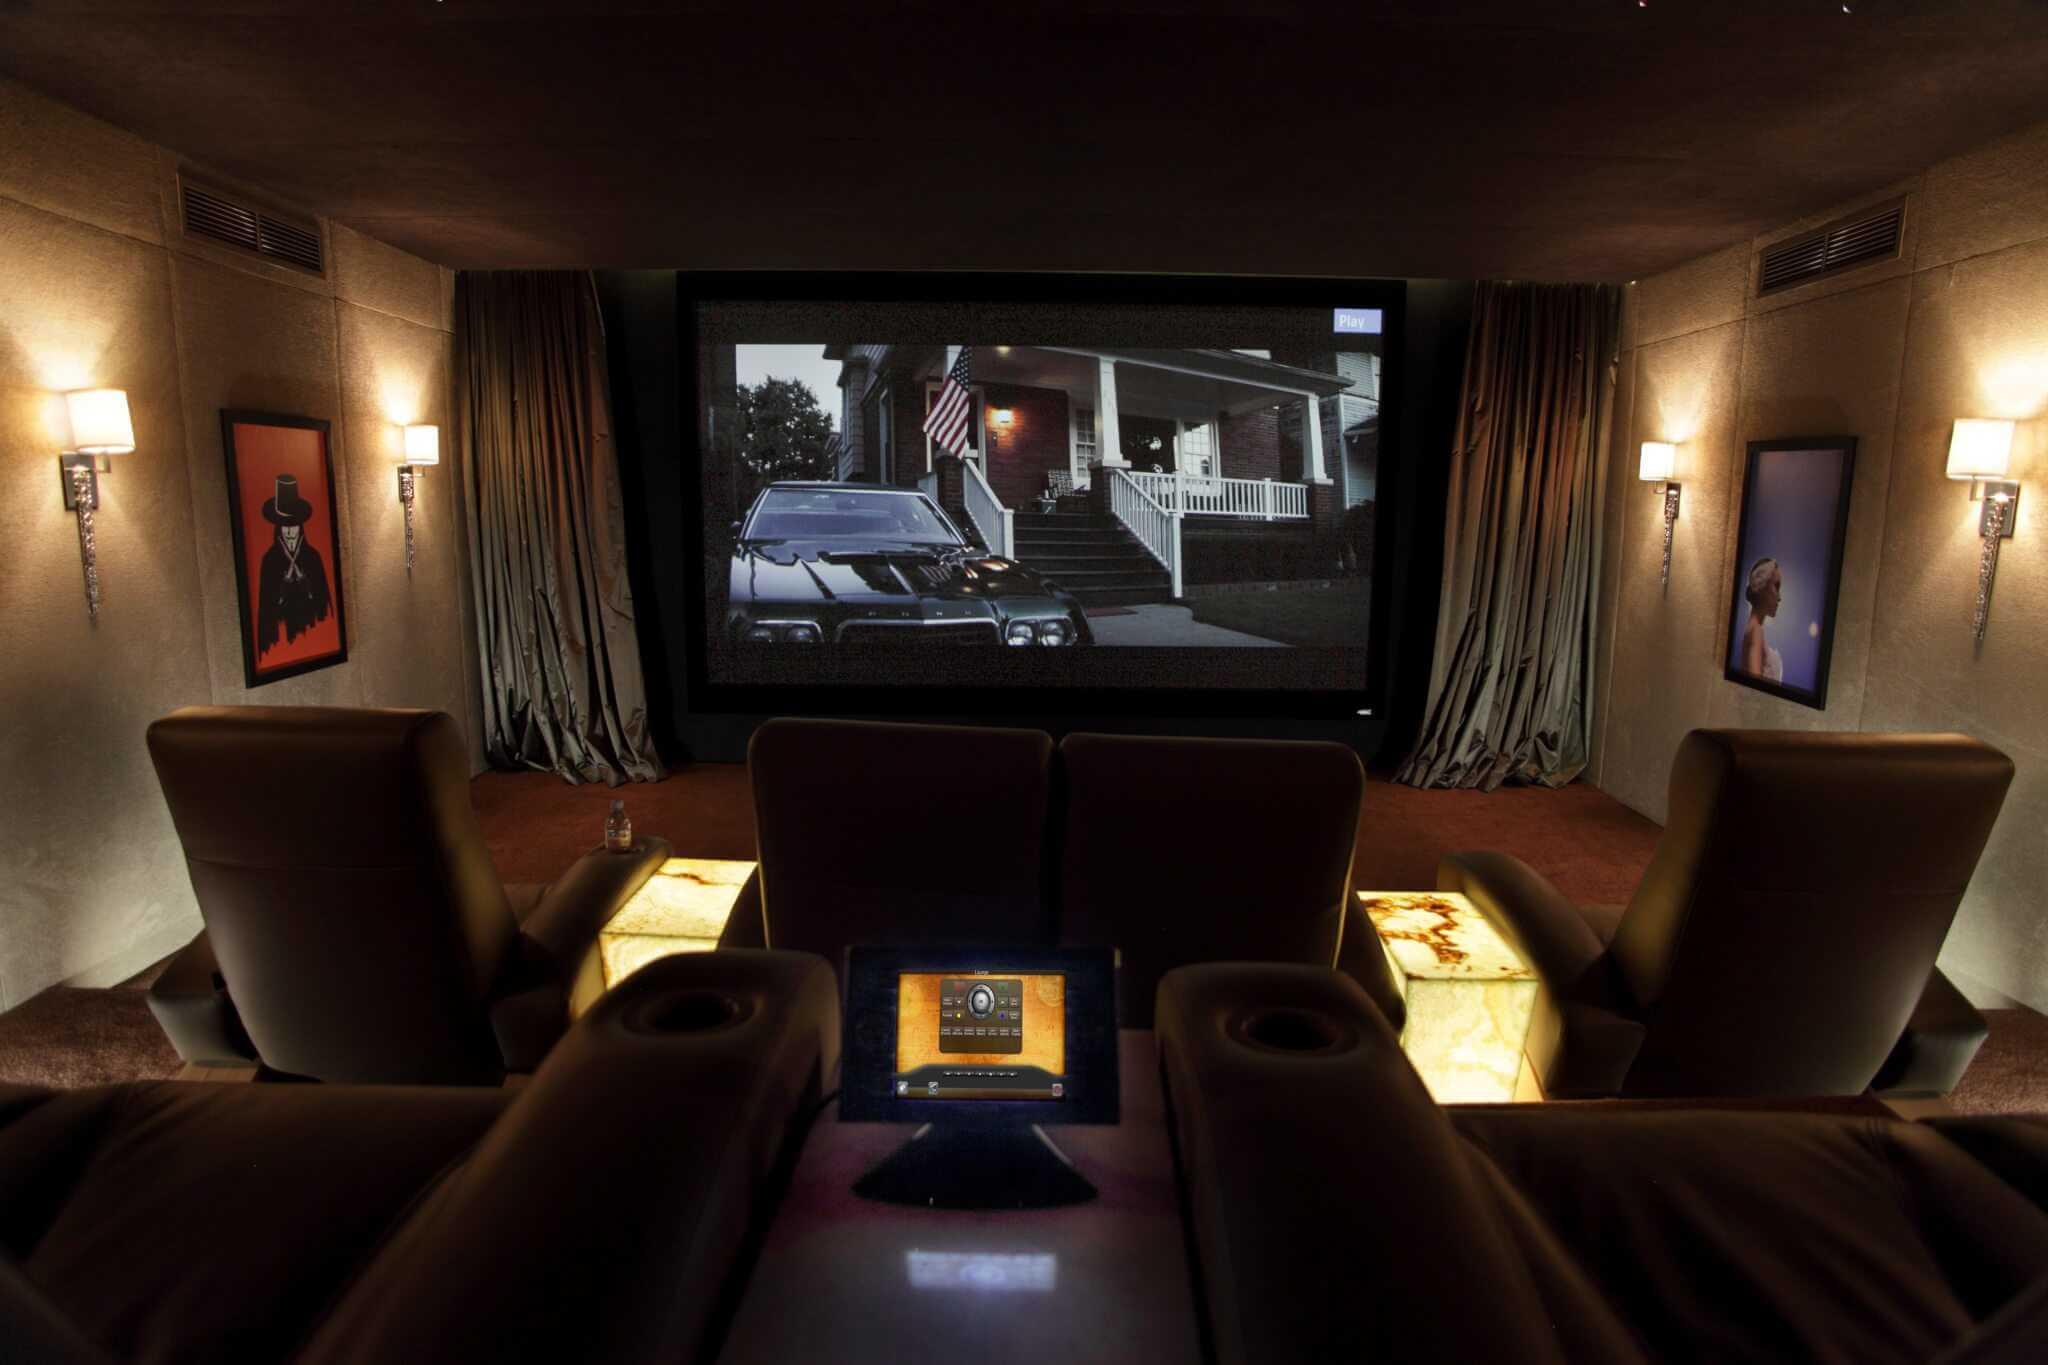 Dubai Home Cinema - Showing Seating